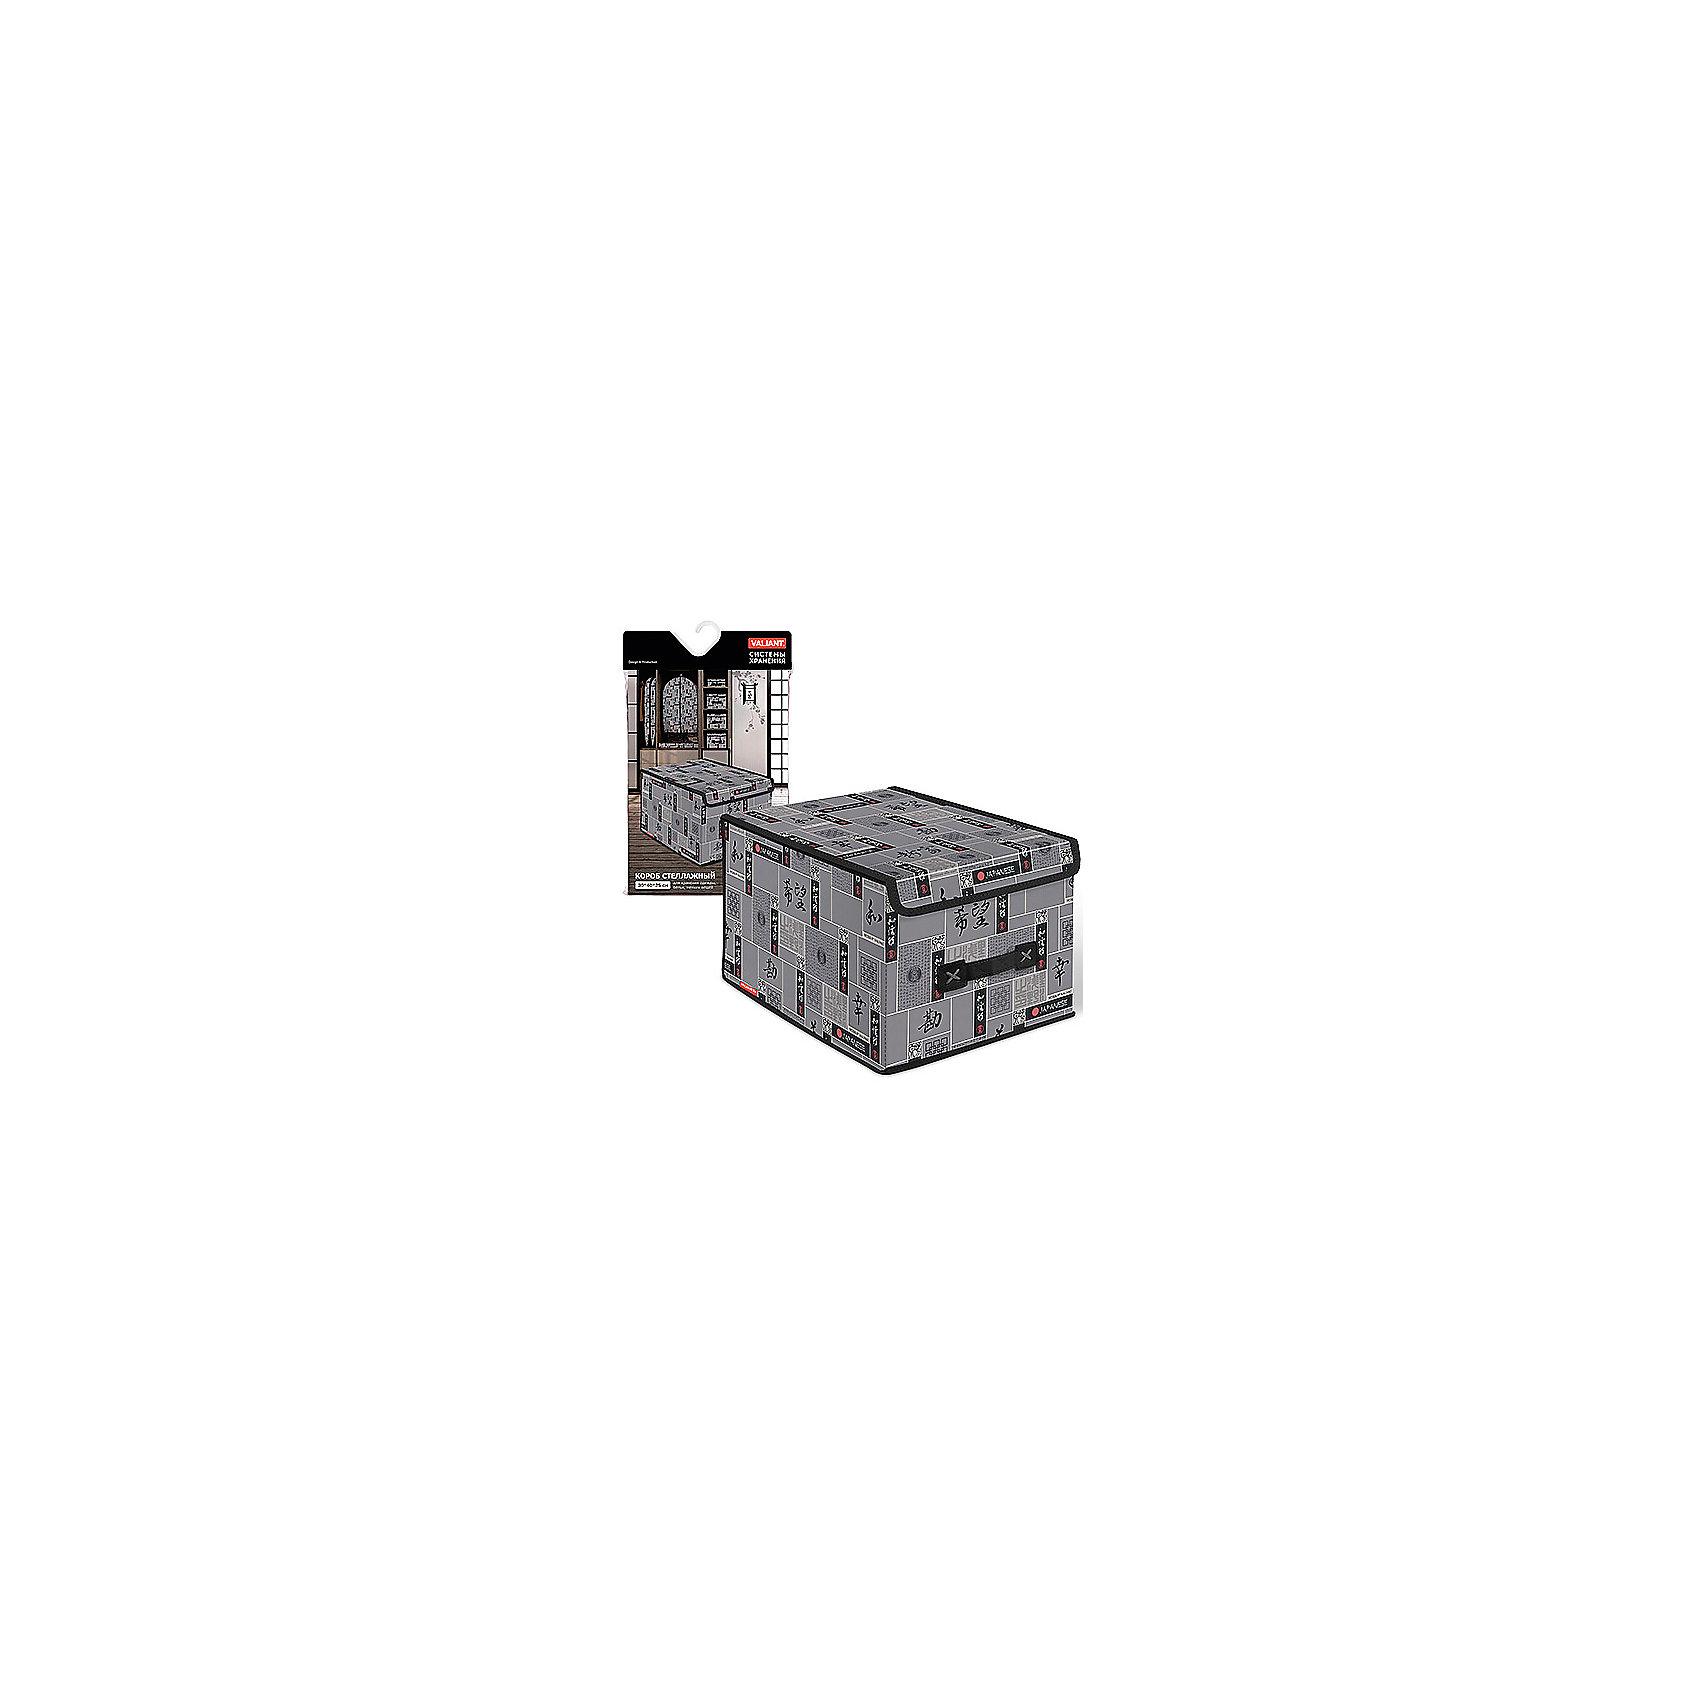 VALIANT Короб стеллажный с крышкой, большой, 30*40*25 см, JAPANESE BLACK, Valiant